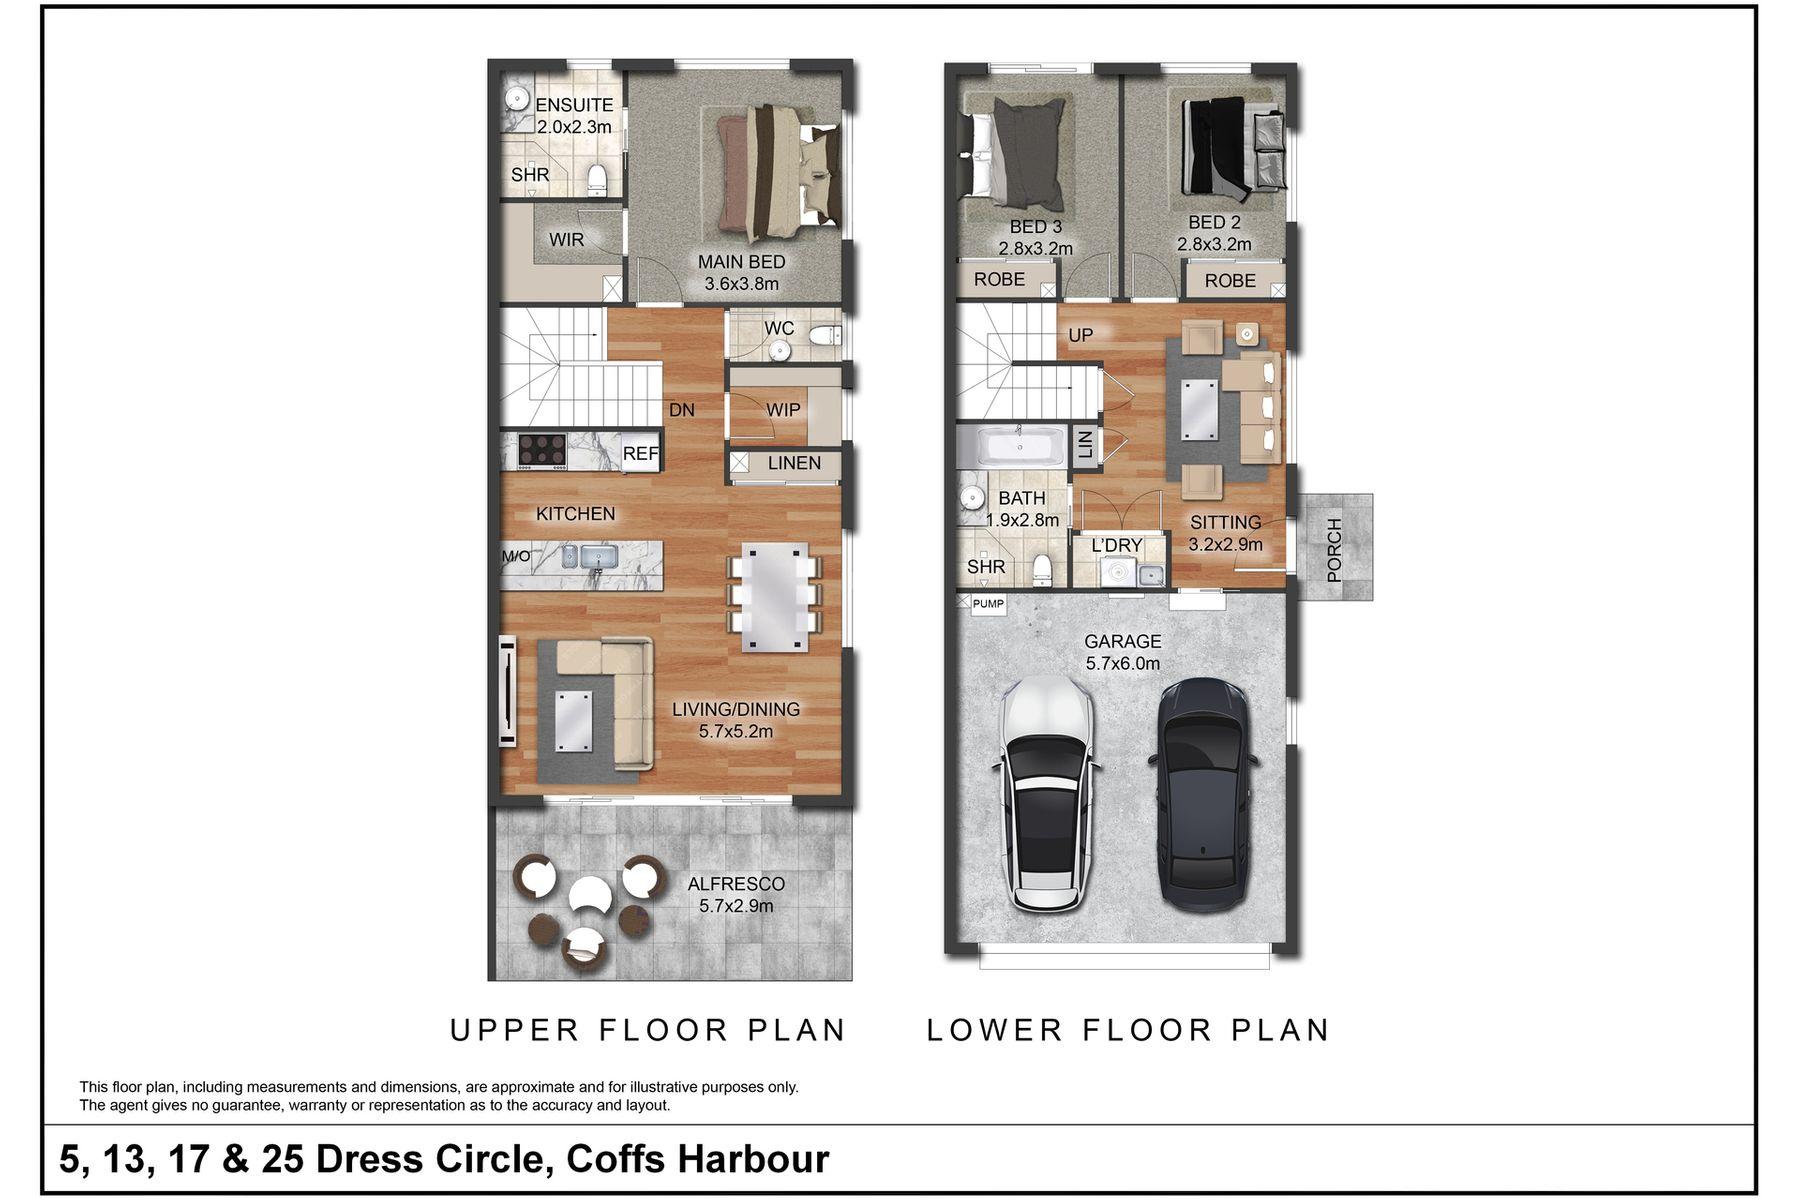 9 Dress Circle, Coffs Harbour, NSW 2450